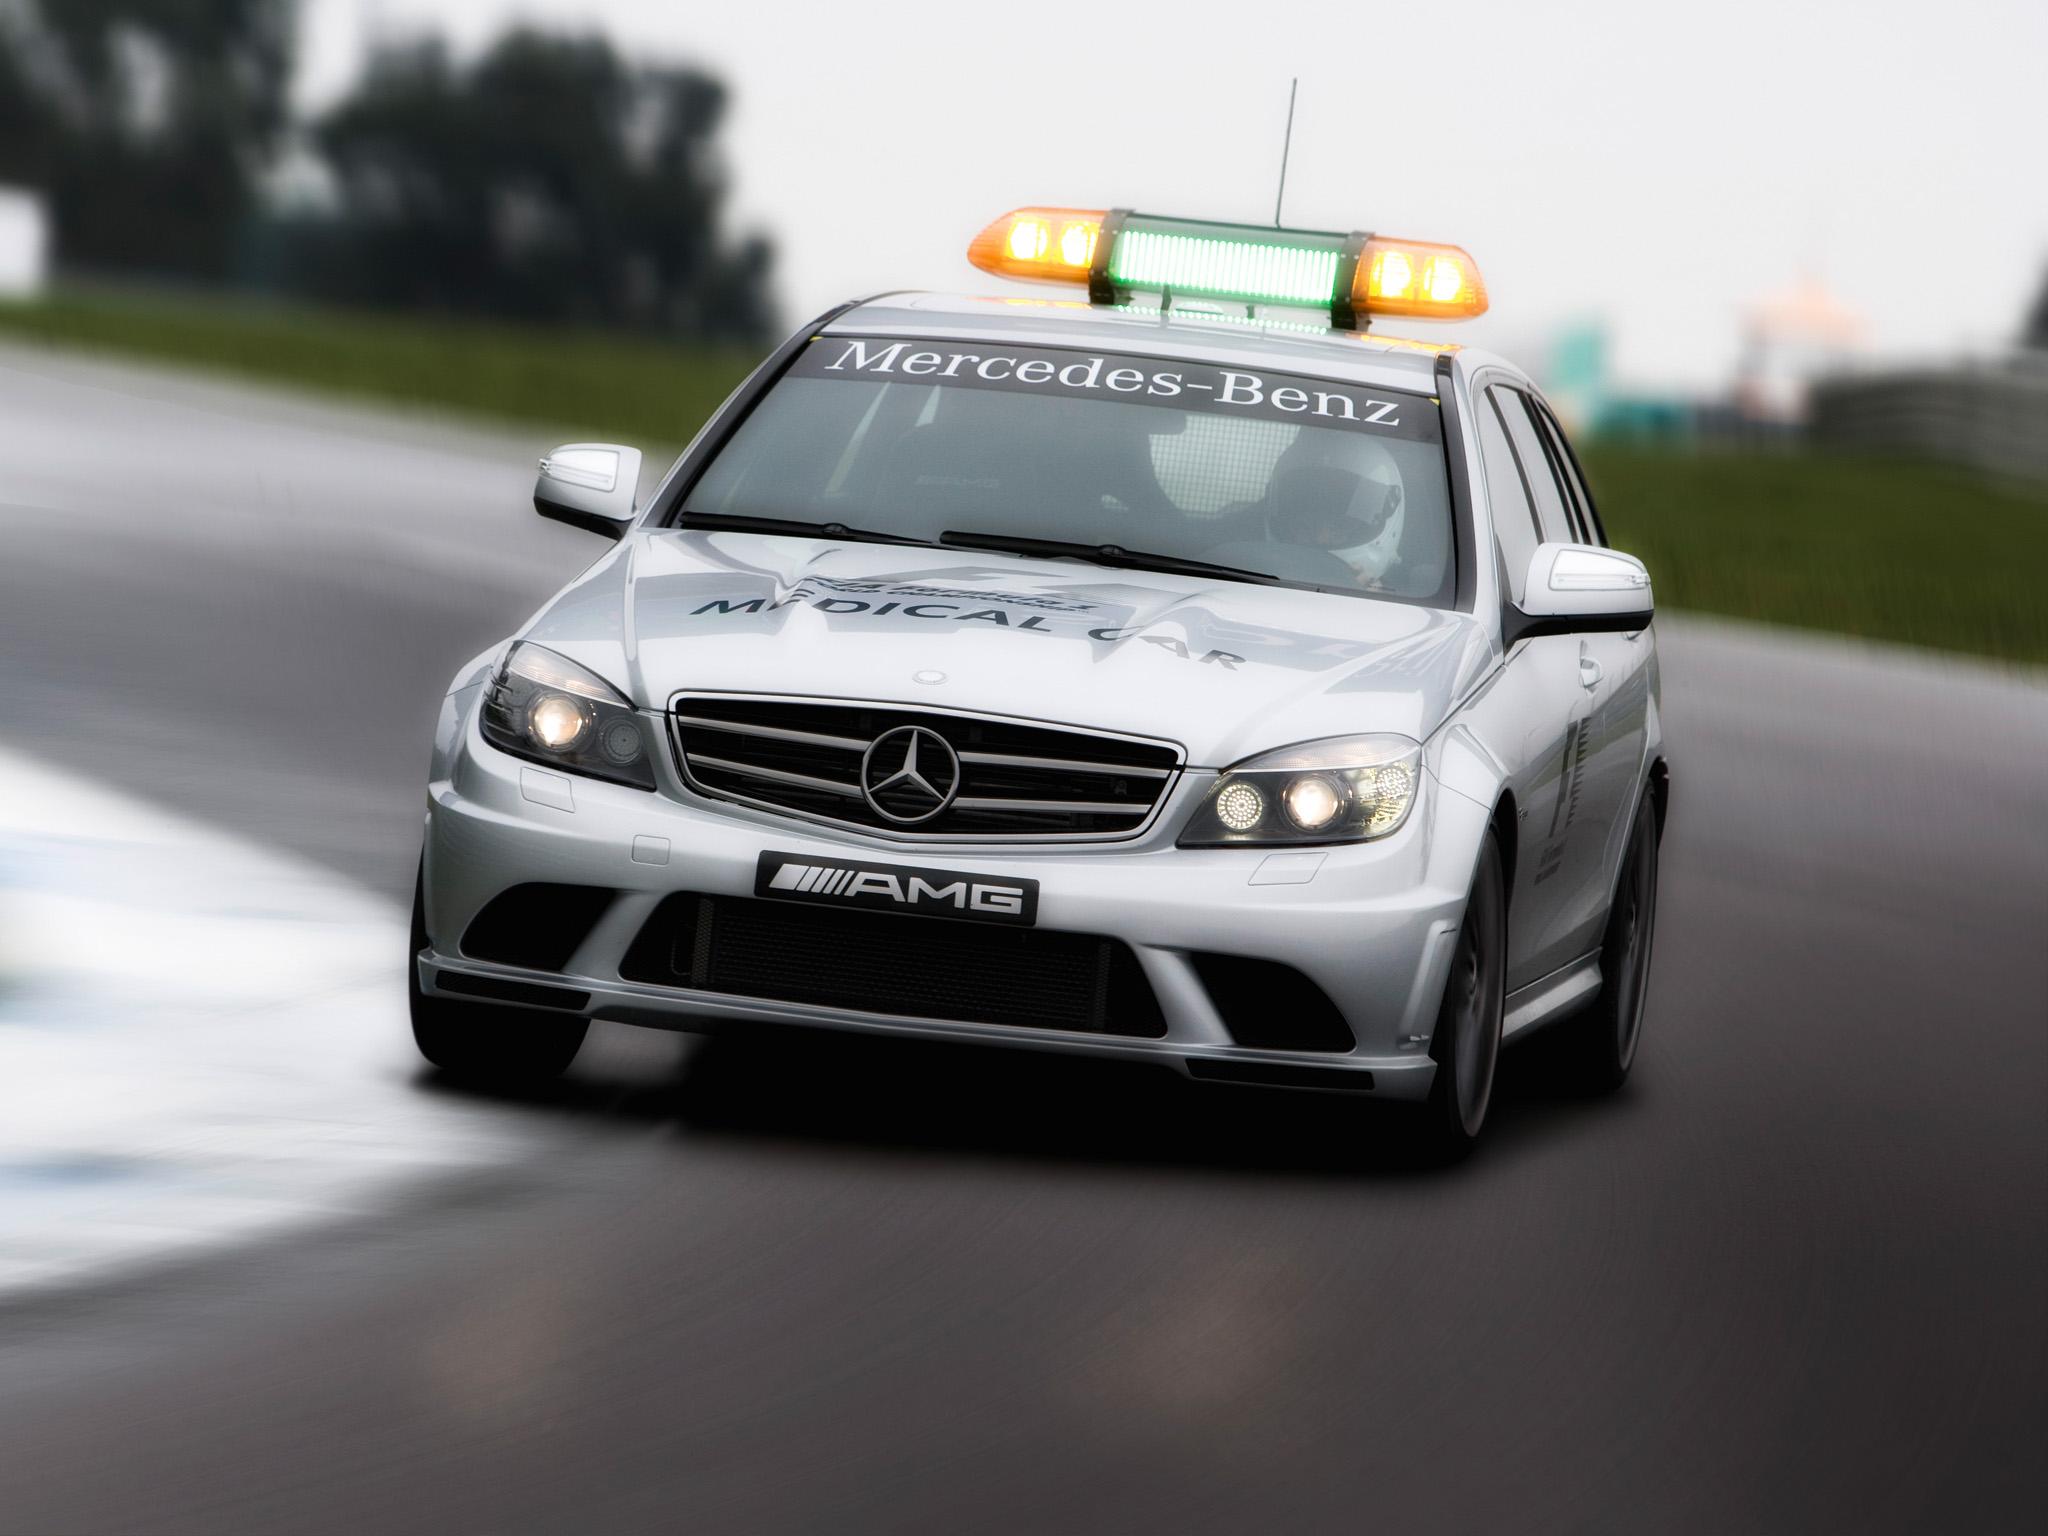 2008 Mercedes Benz C63 Amg Estate F 1 Medical Car S204 Race Racing Formula One Stationwagon Wallpaper 2048x1536 151483 Wallpaperup